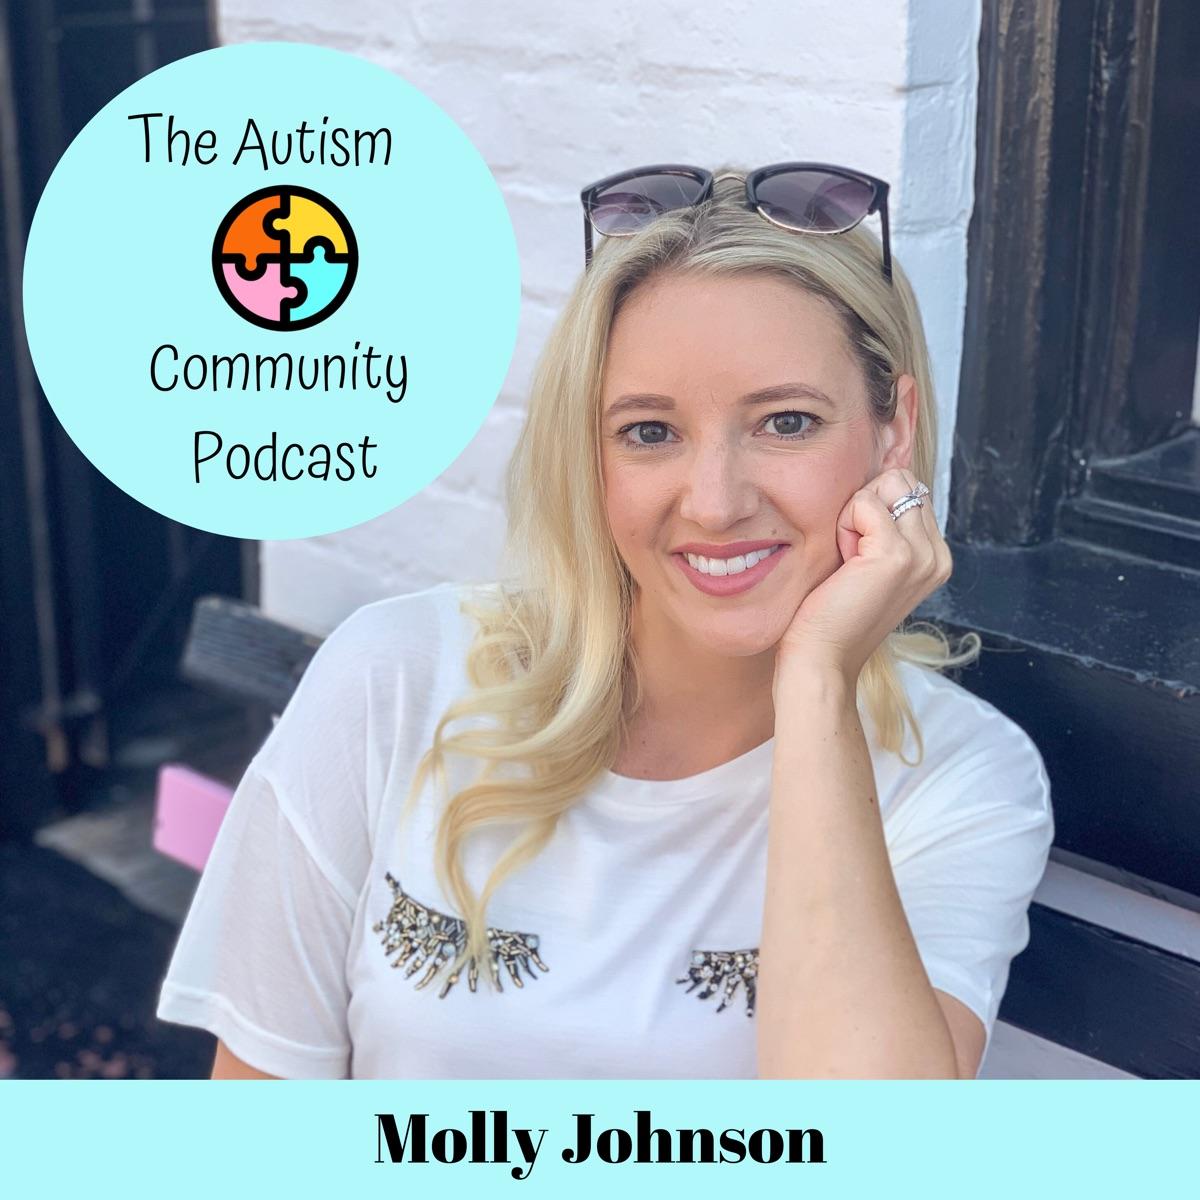 The Autism Community